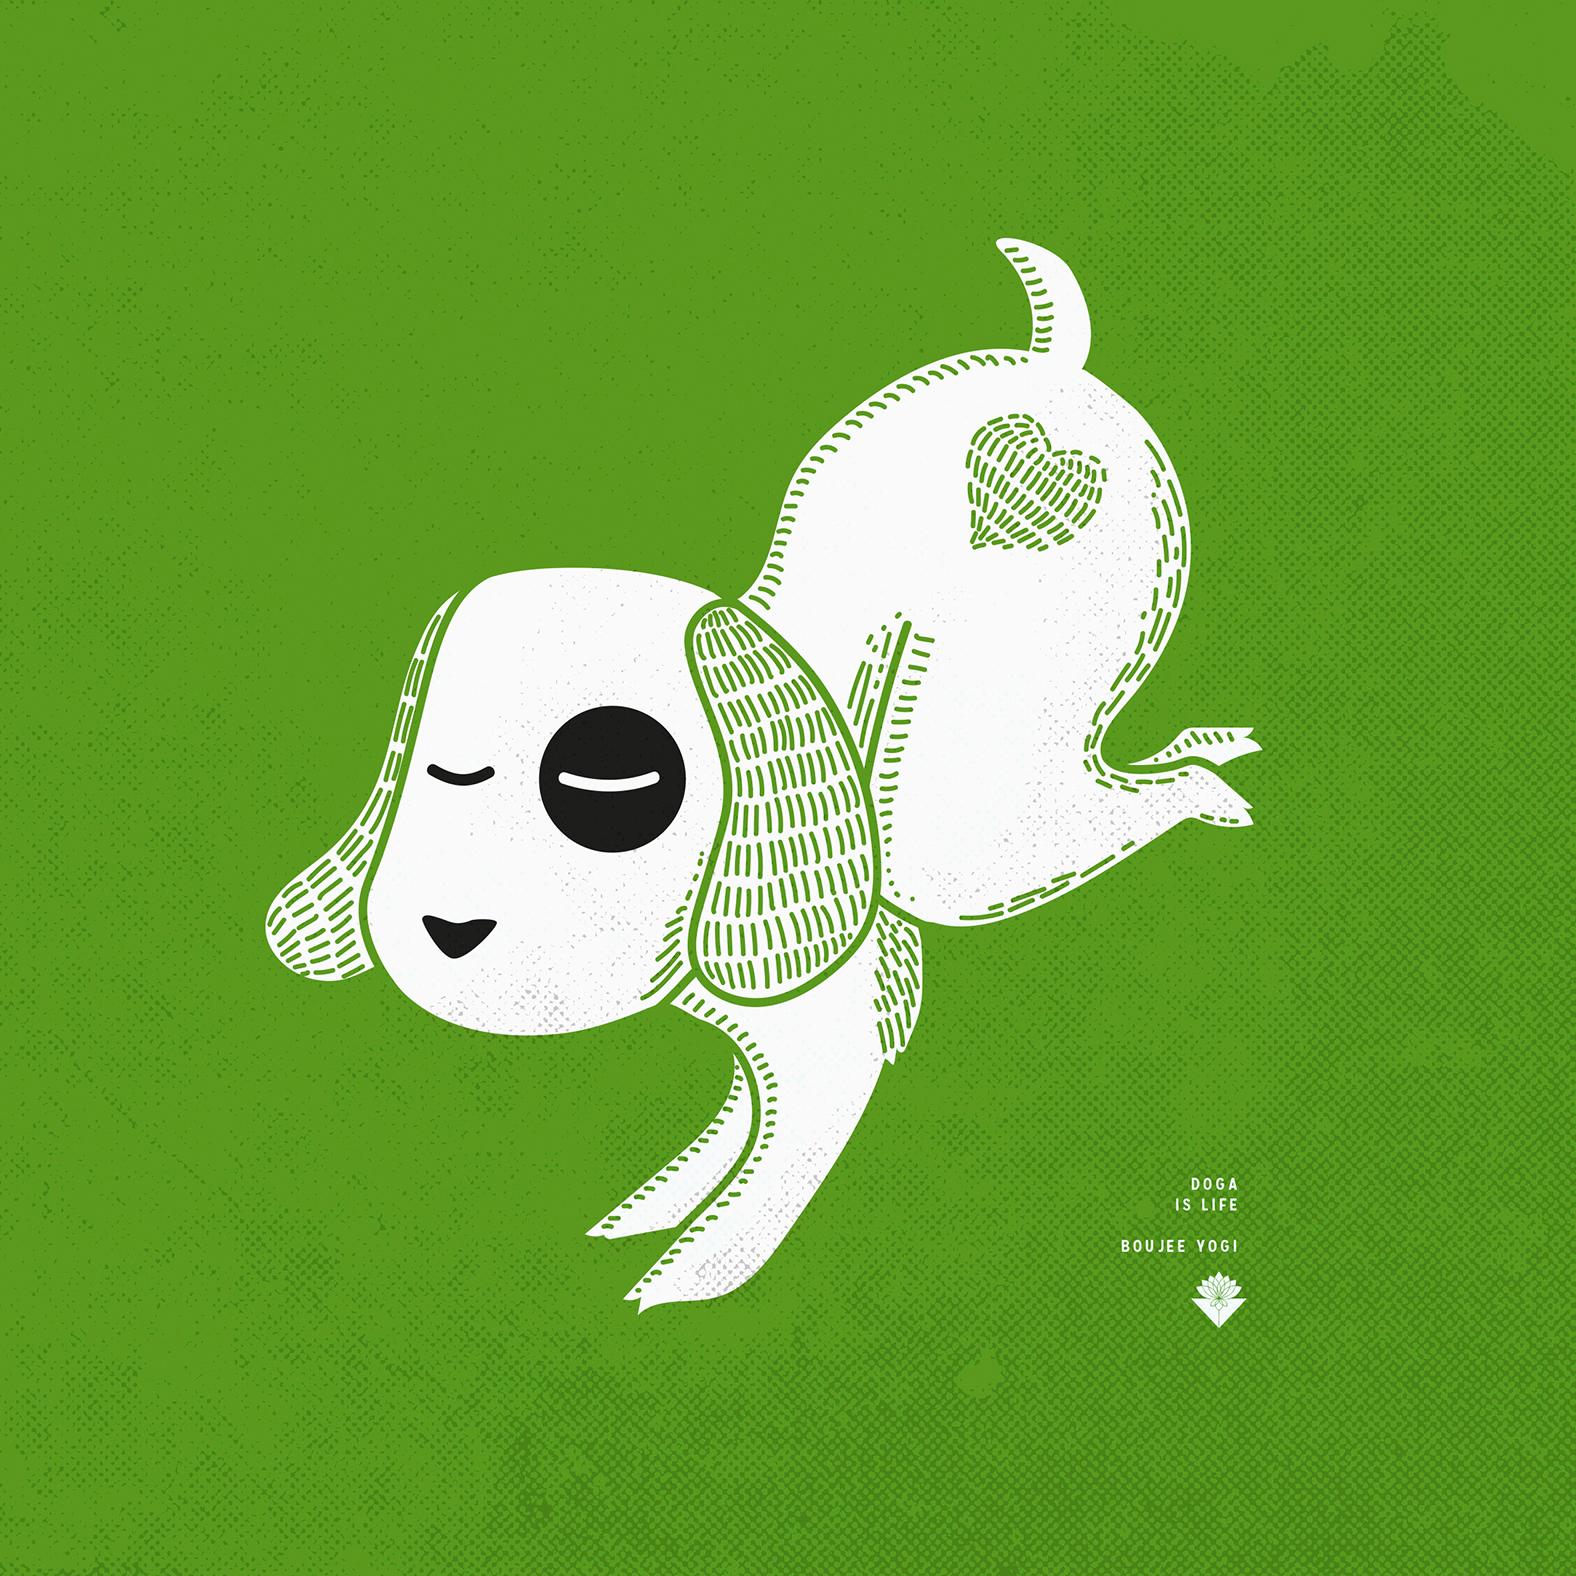 Doga is Life